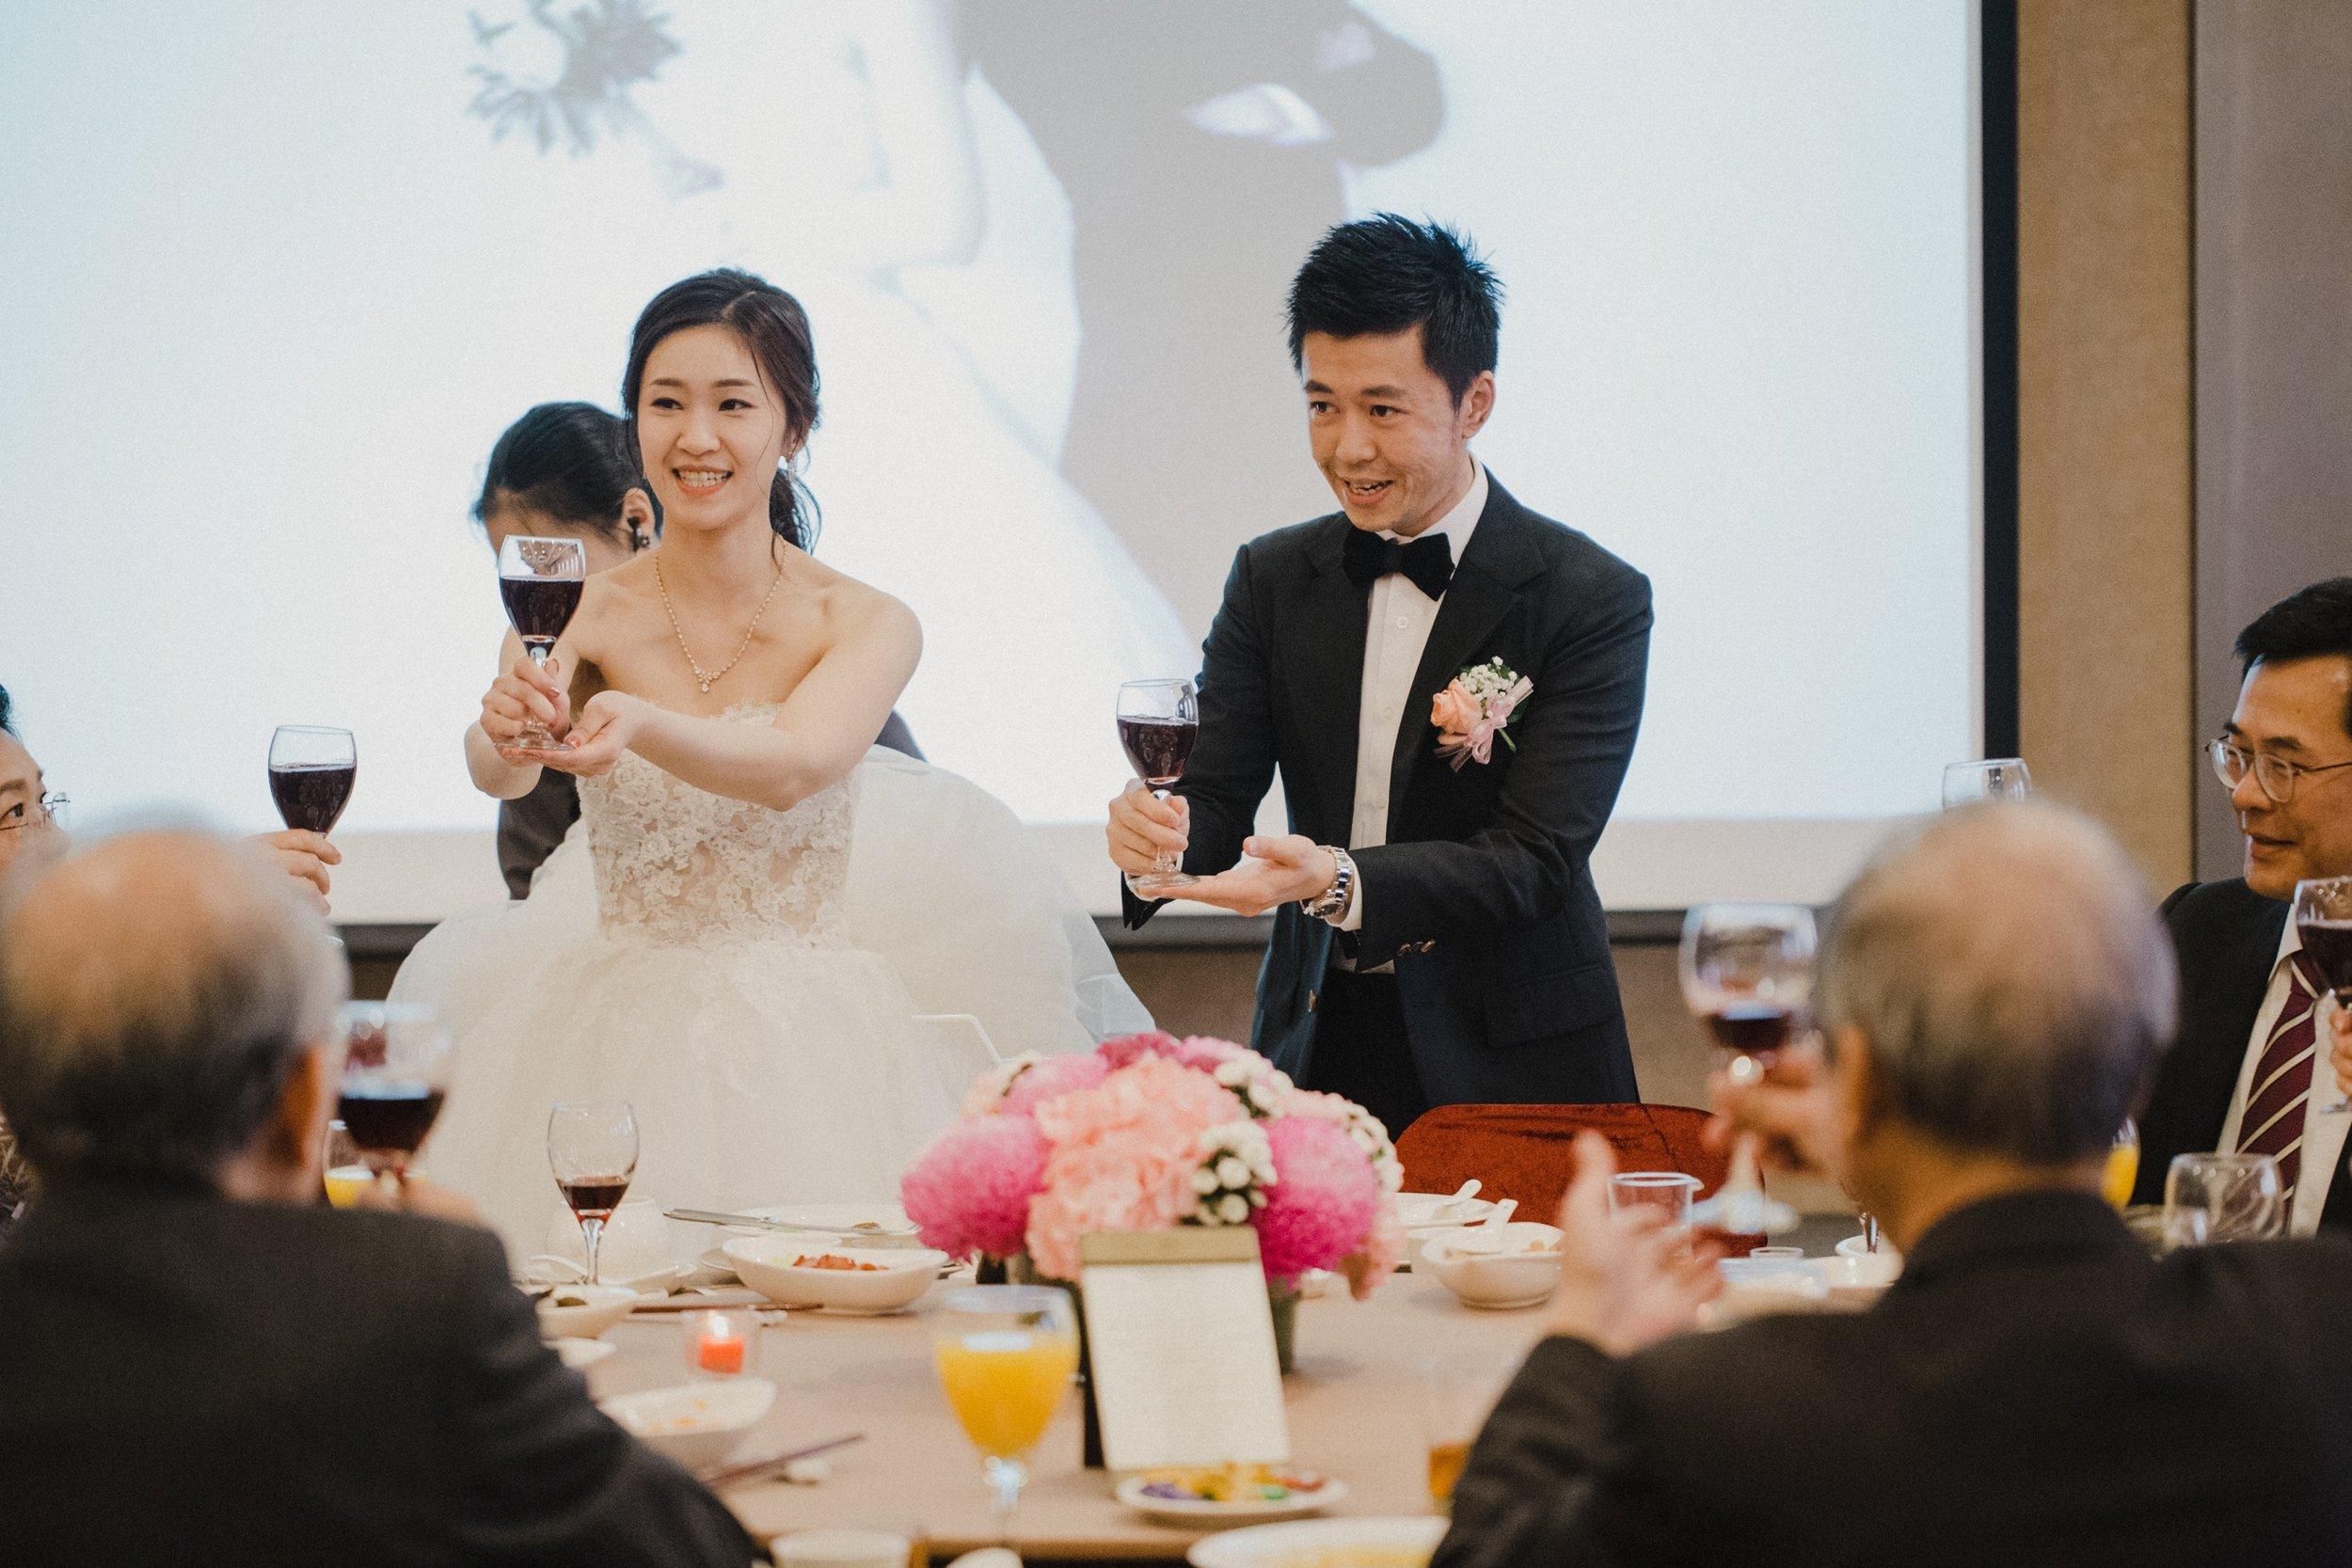 wedding-caridee-oscar-lunch-ambassador-hsinchu-結婚午宴-新竹國賓_123.jpg